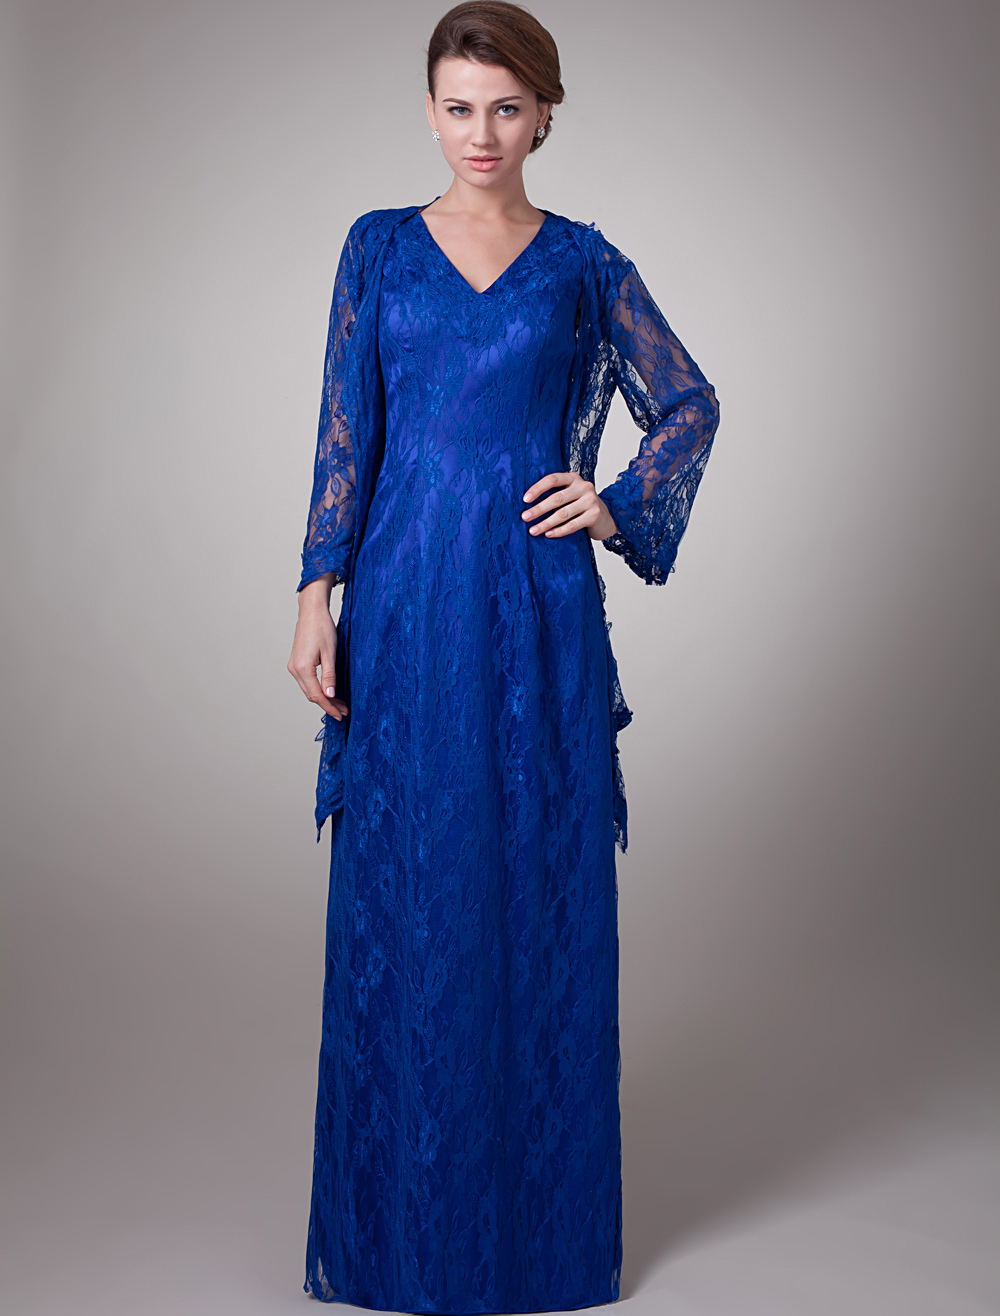 Hottest Blue Elastic Woven Satin V-Neck Mother of The Bride Dress